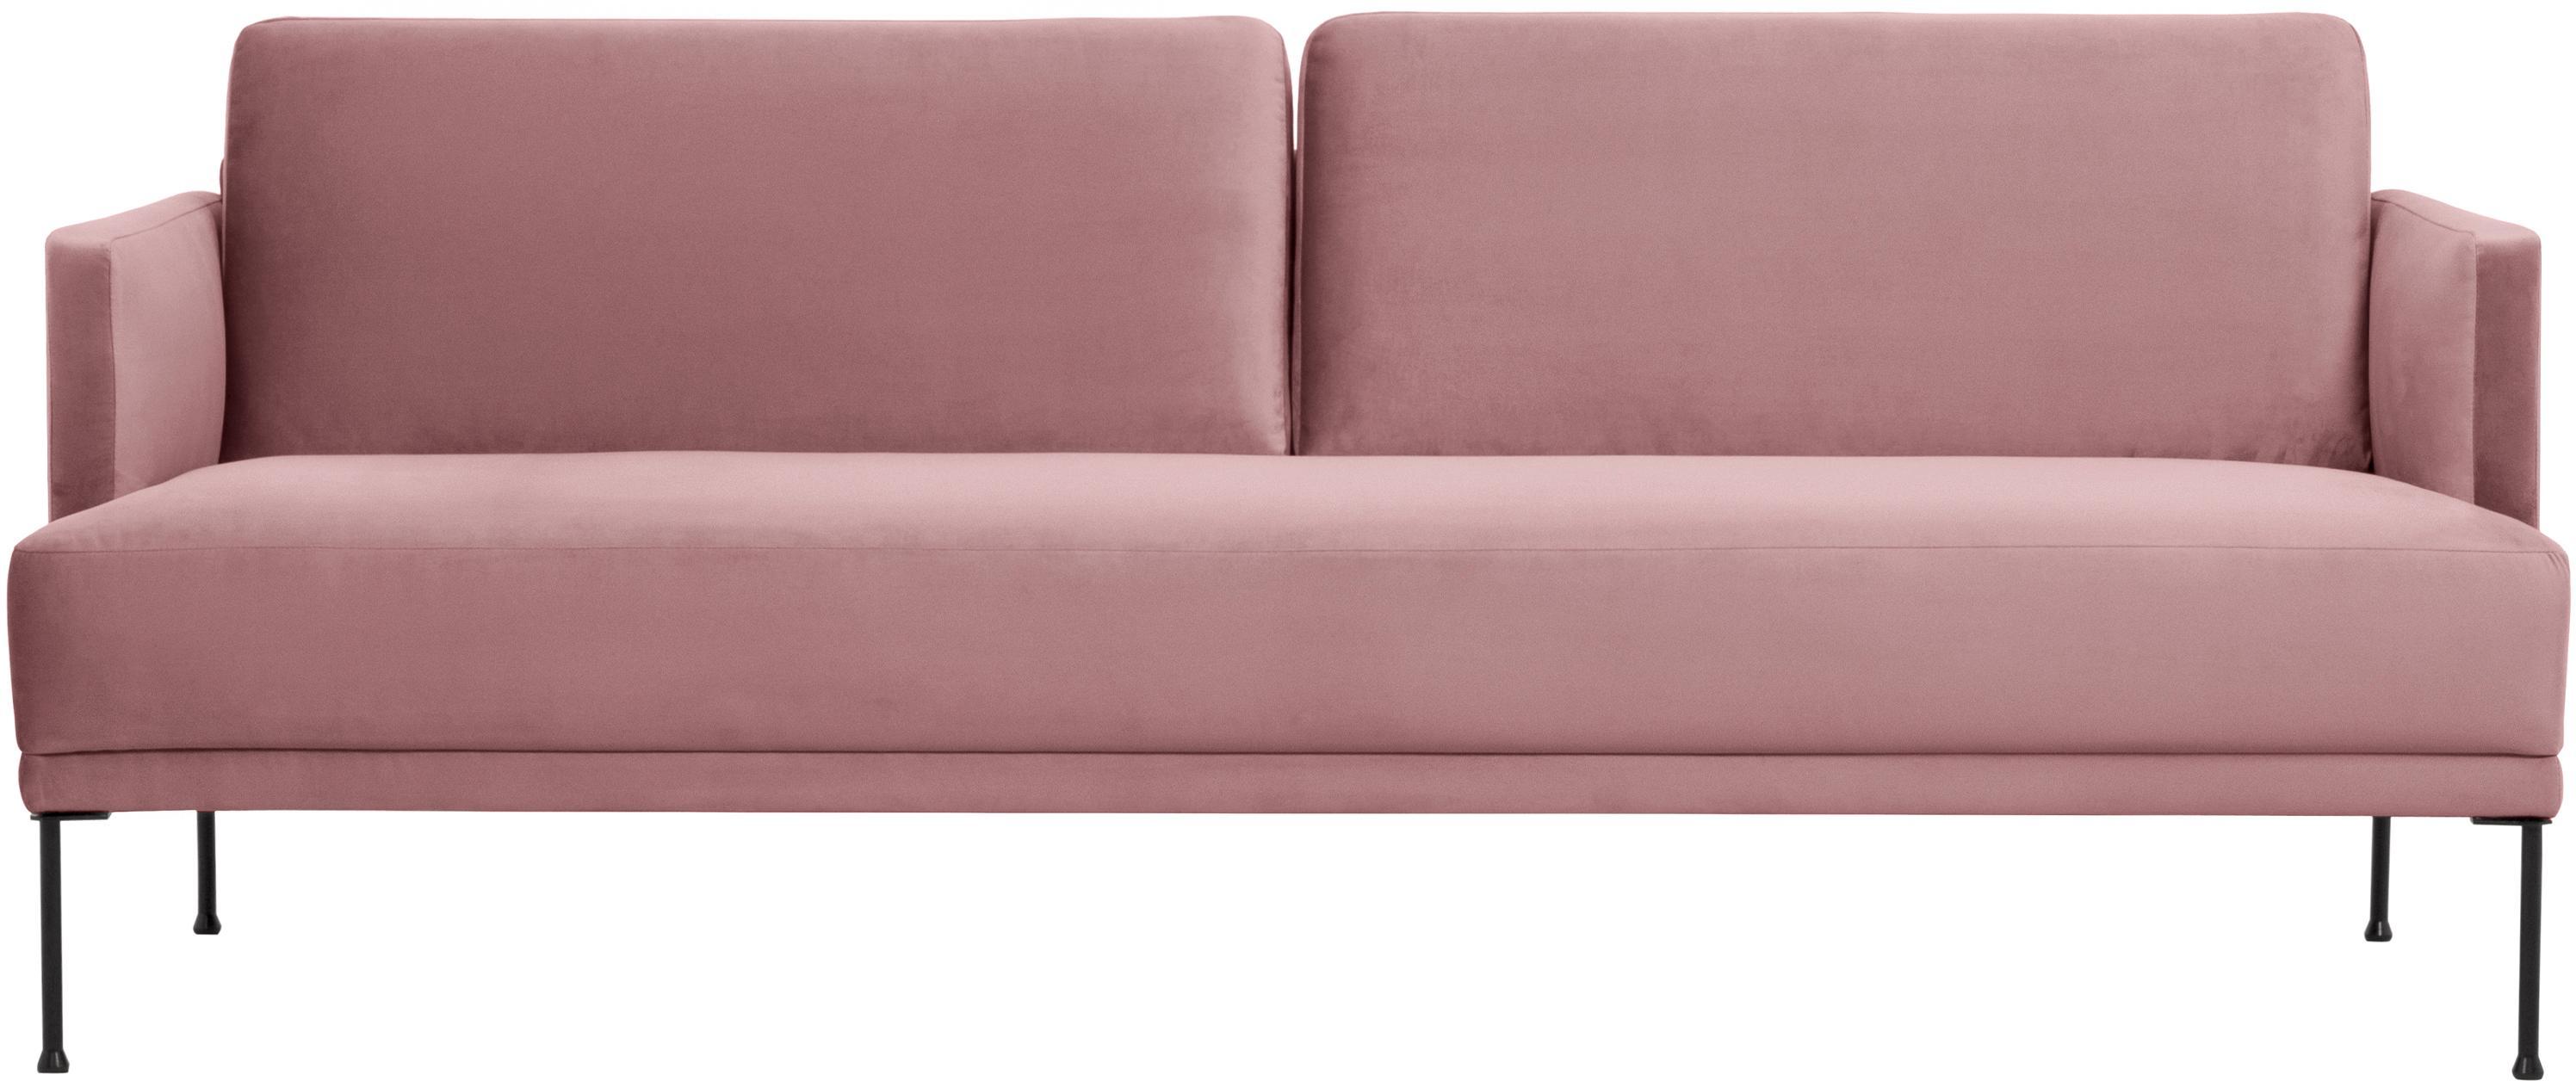 Samt-Sofa Fluente (3-Sitzer), Bezug: Samt (Hochwertiger Polyes, Gestell: Massives Kiefernholz, Samt Rosa, B 196 x T 85 cm